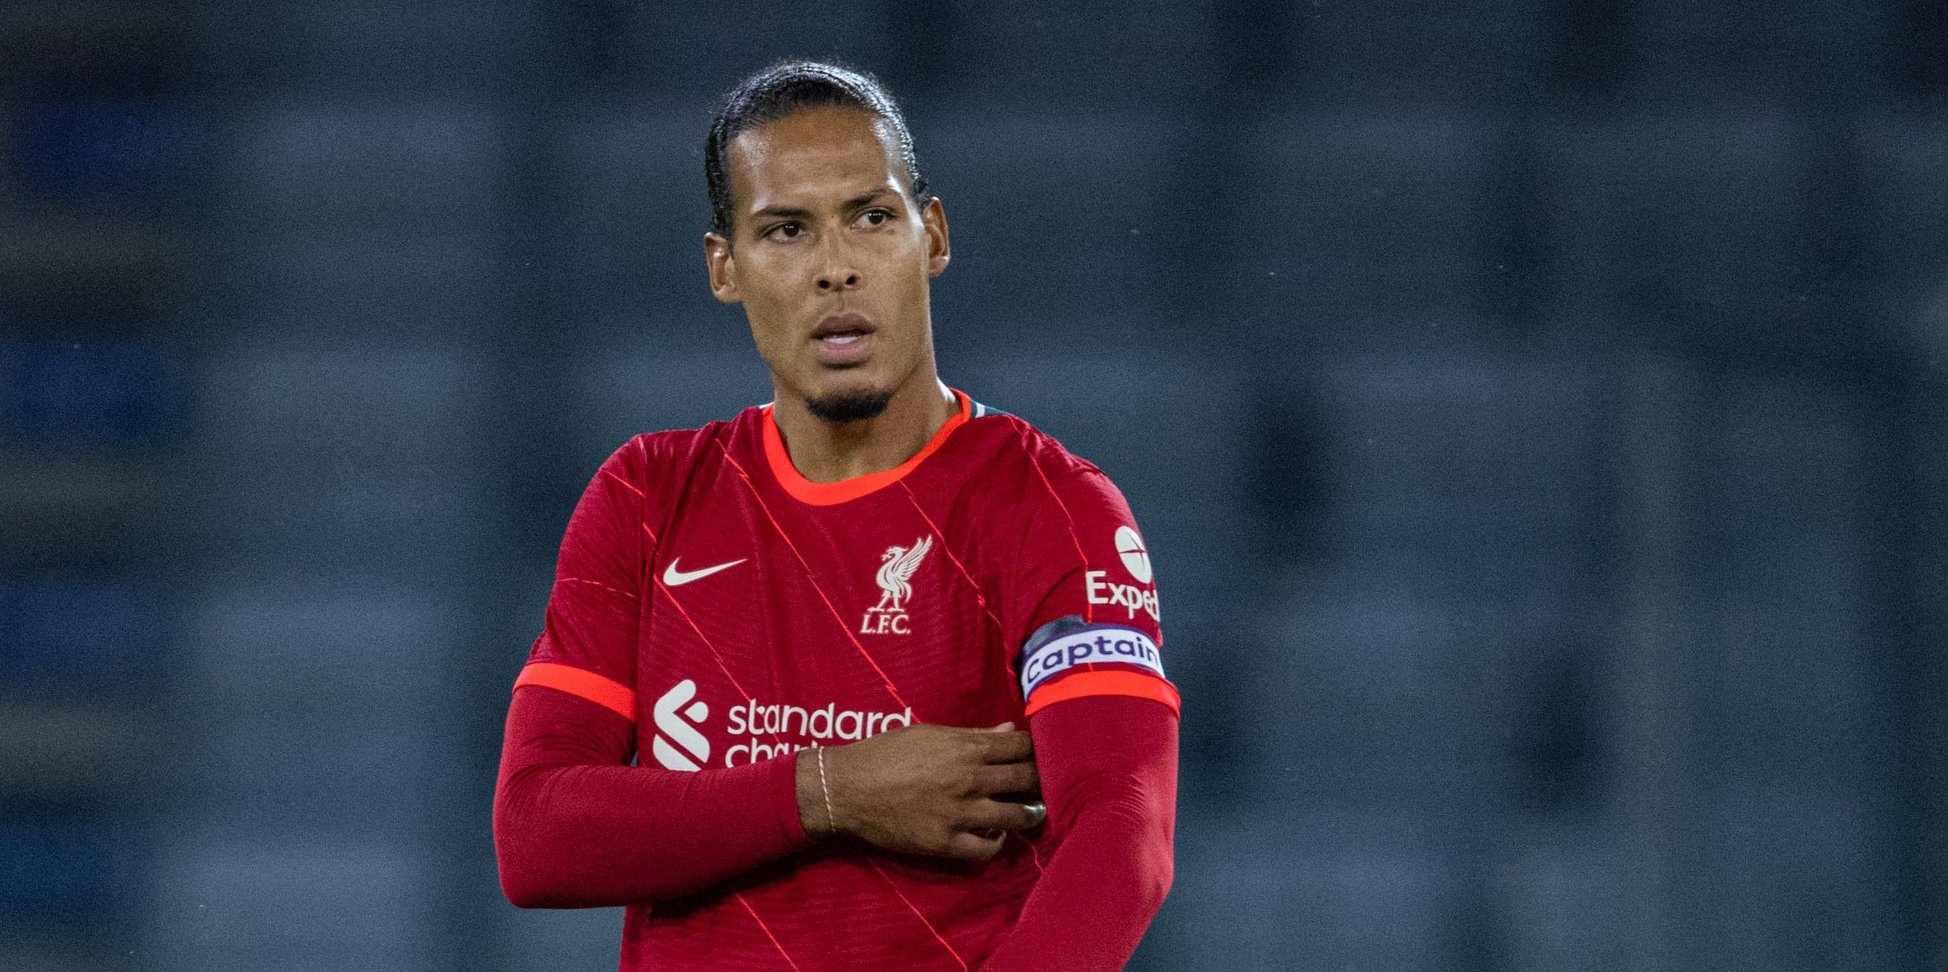 Liverpool v Athletic Bilbao team news confirmed as Virgil van Dijk starts